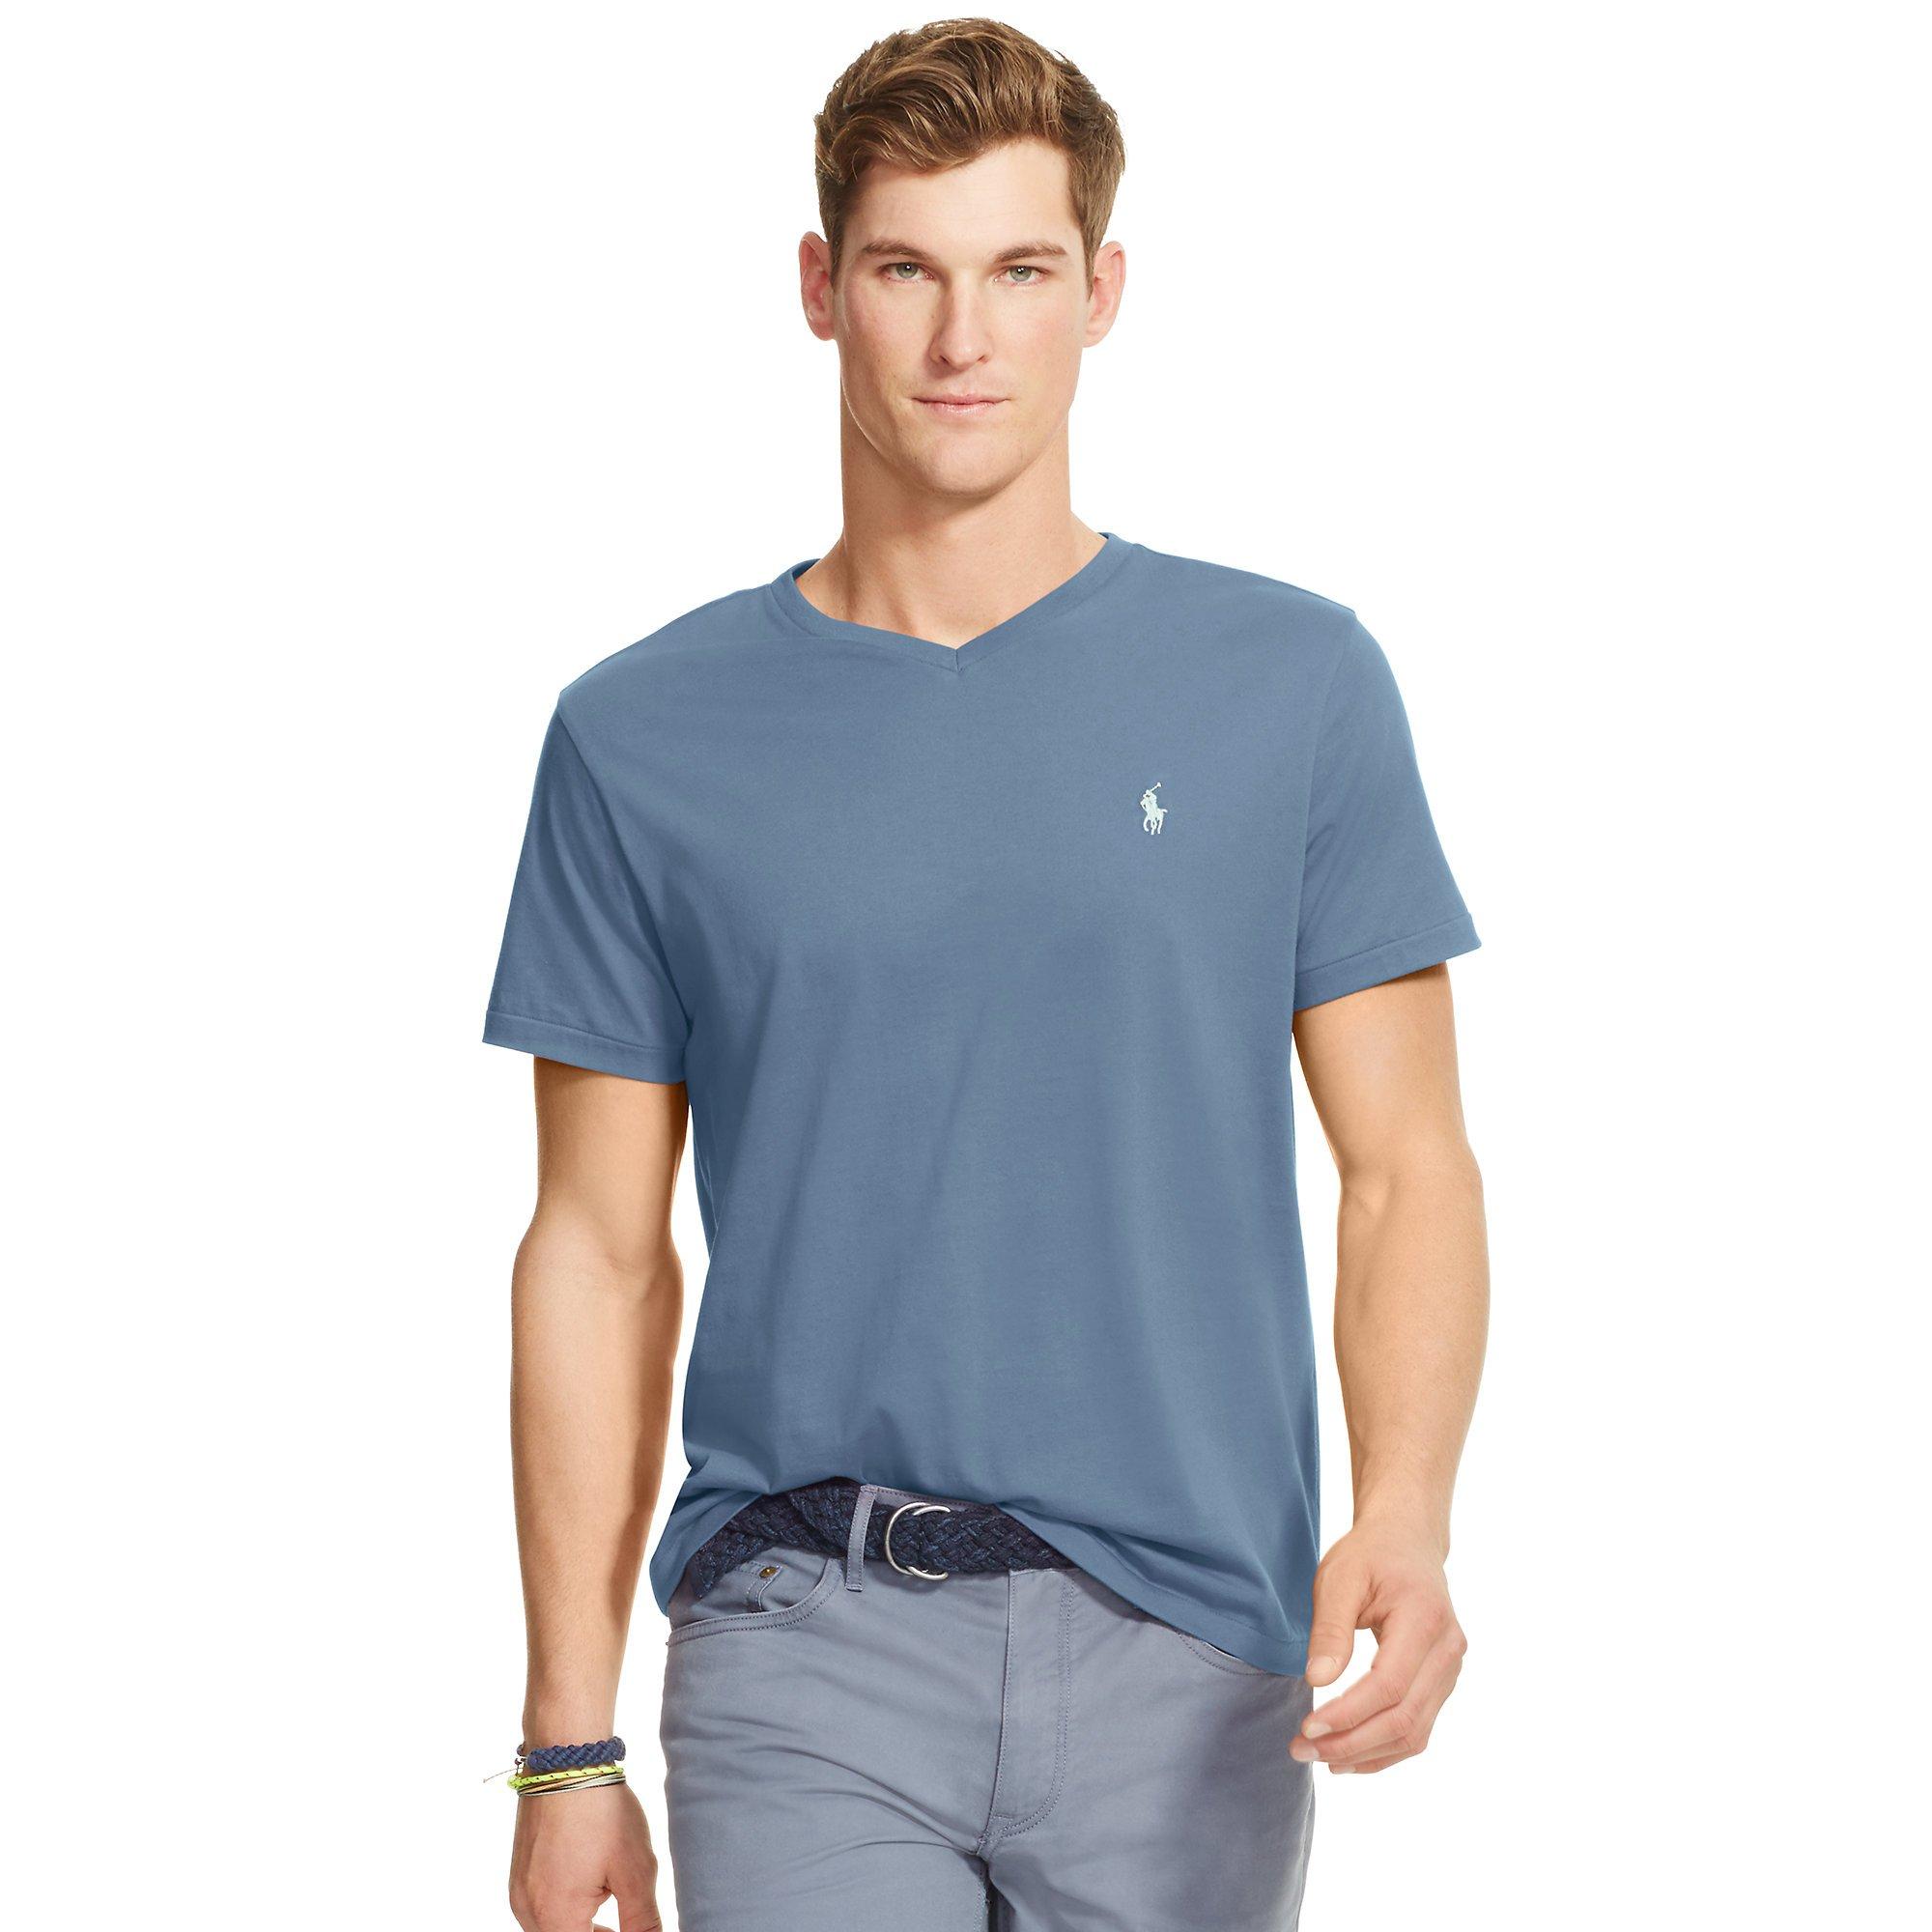 lyst polo ralph lauren cotton jersey v neck t shirt in blue for men. Black Bedroom Furniture Sets. Home Design Ideas